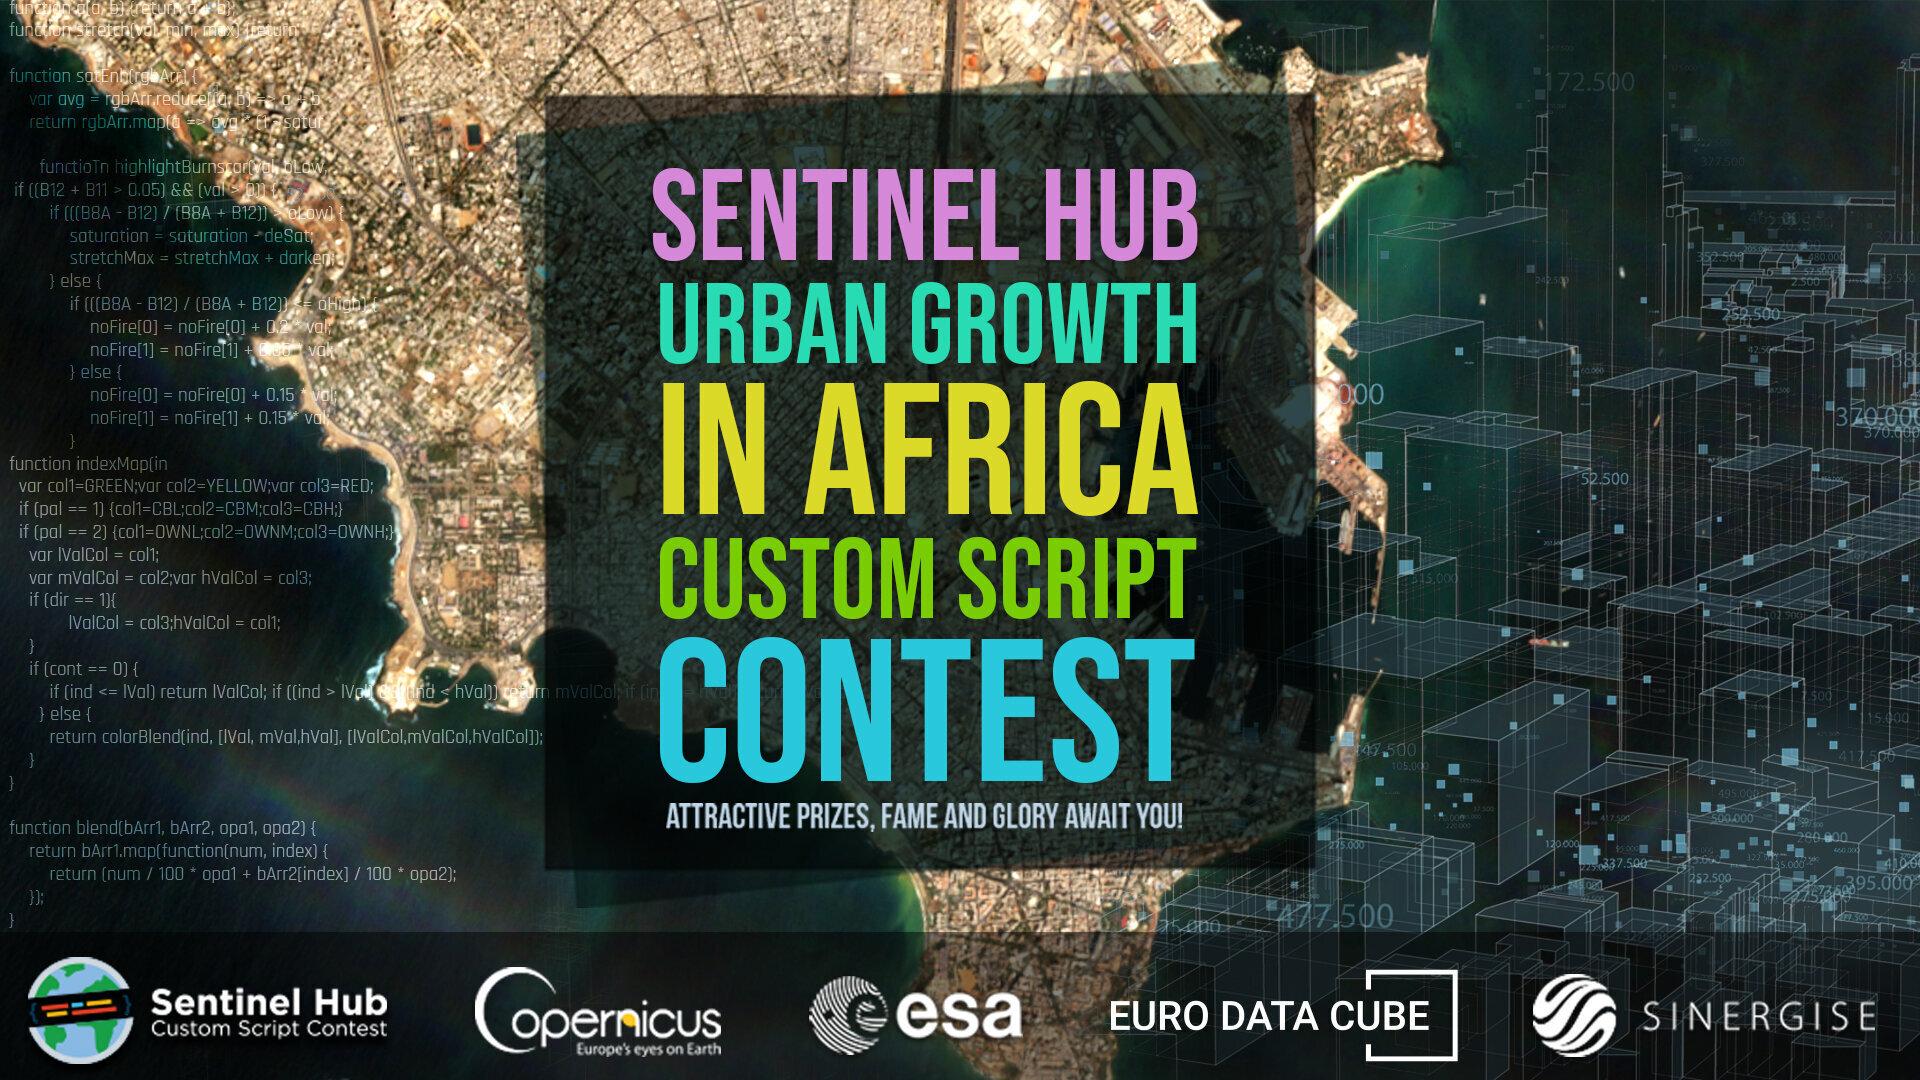 c9246288-4f4c-11e9-a3c9-06b79b628af2%2F1618231019473-urban_africa_contest2.jpg